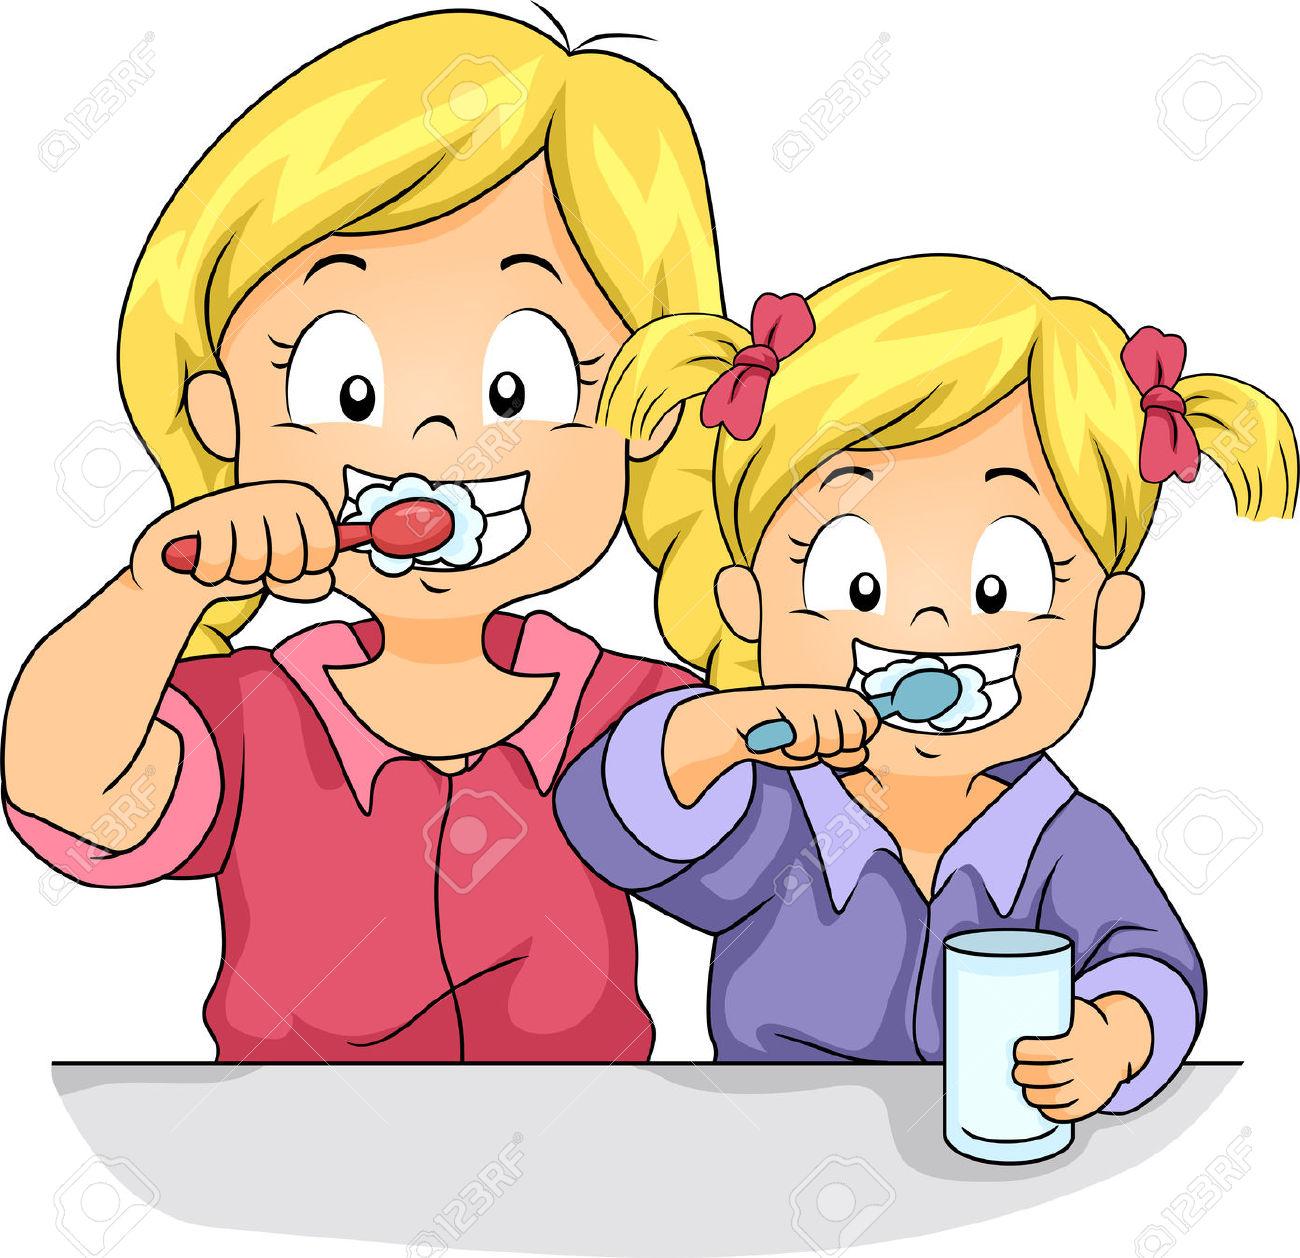 Clipart Brushing Teeth.